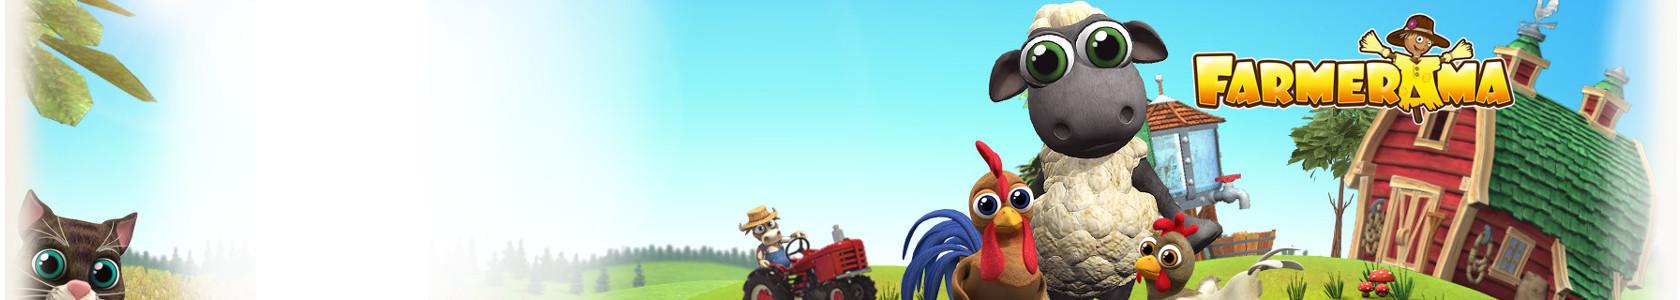 Farmerama, die bekannte Farm Simulation